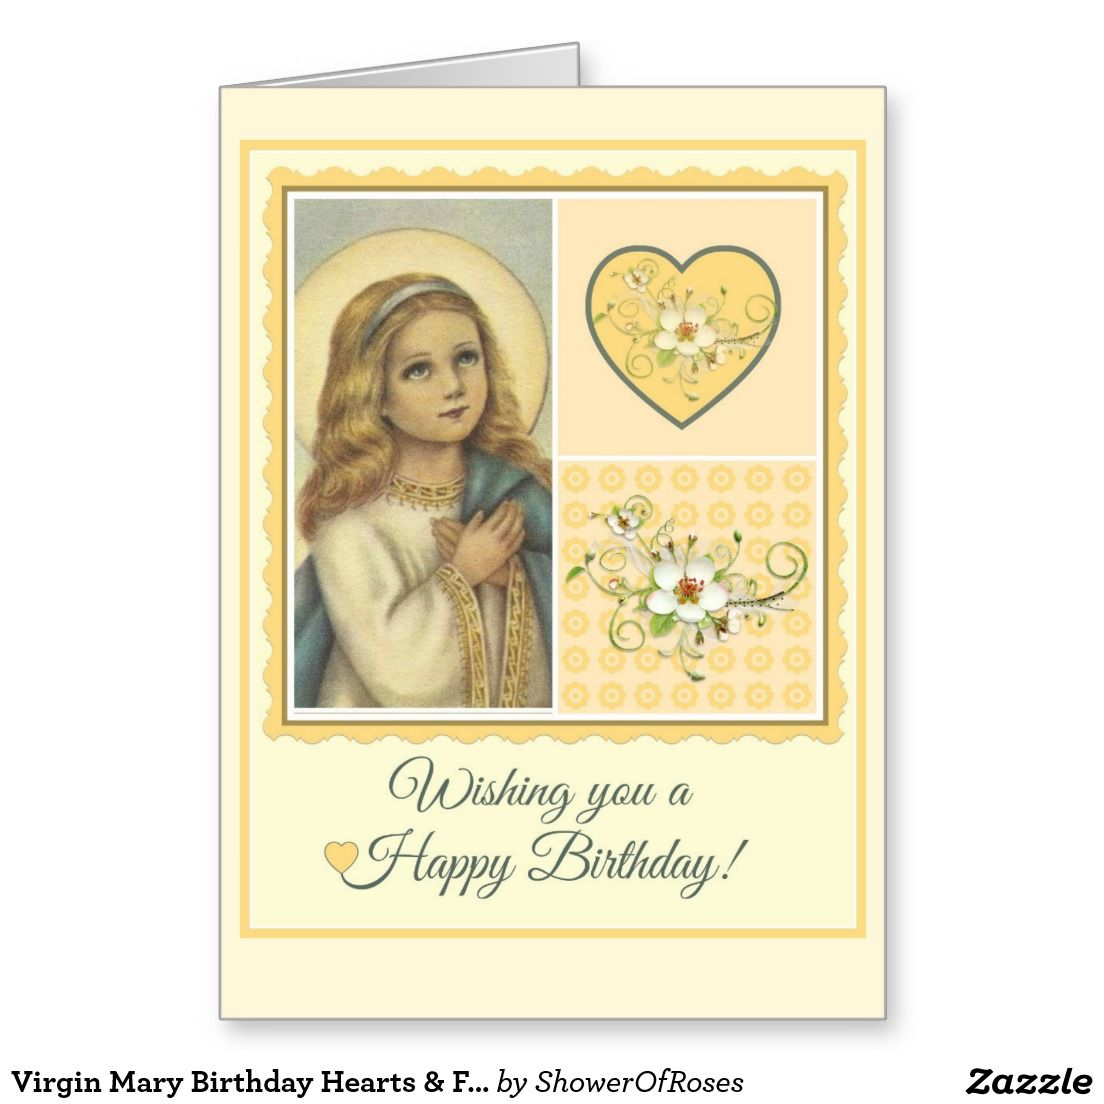 Virgin Mary Birthday Hearts Flowers Card Pinterest Virgin Mary